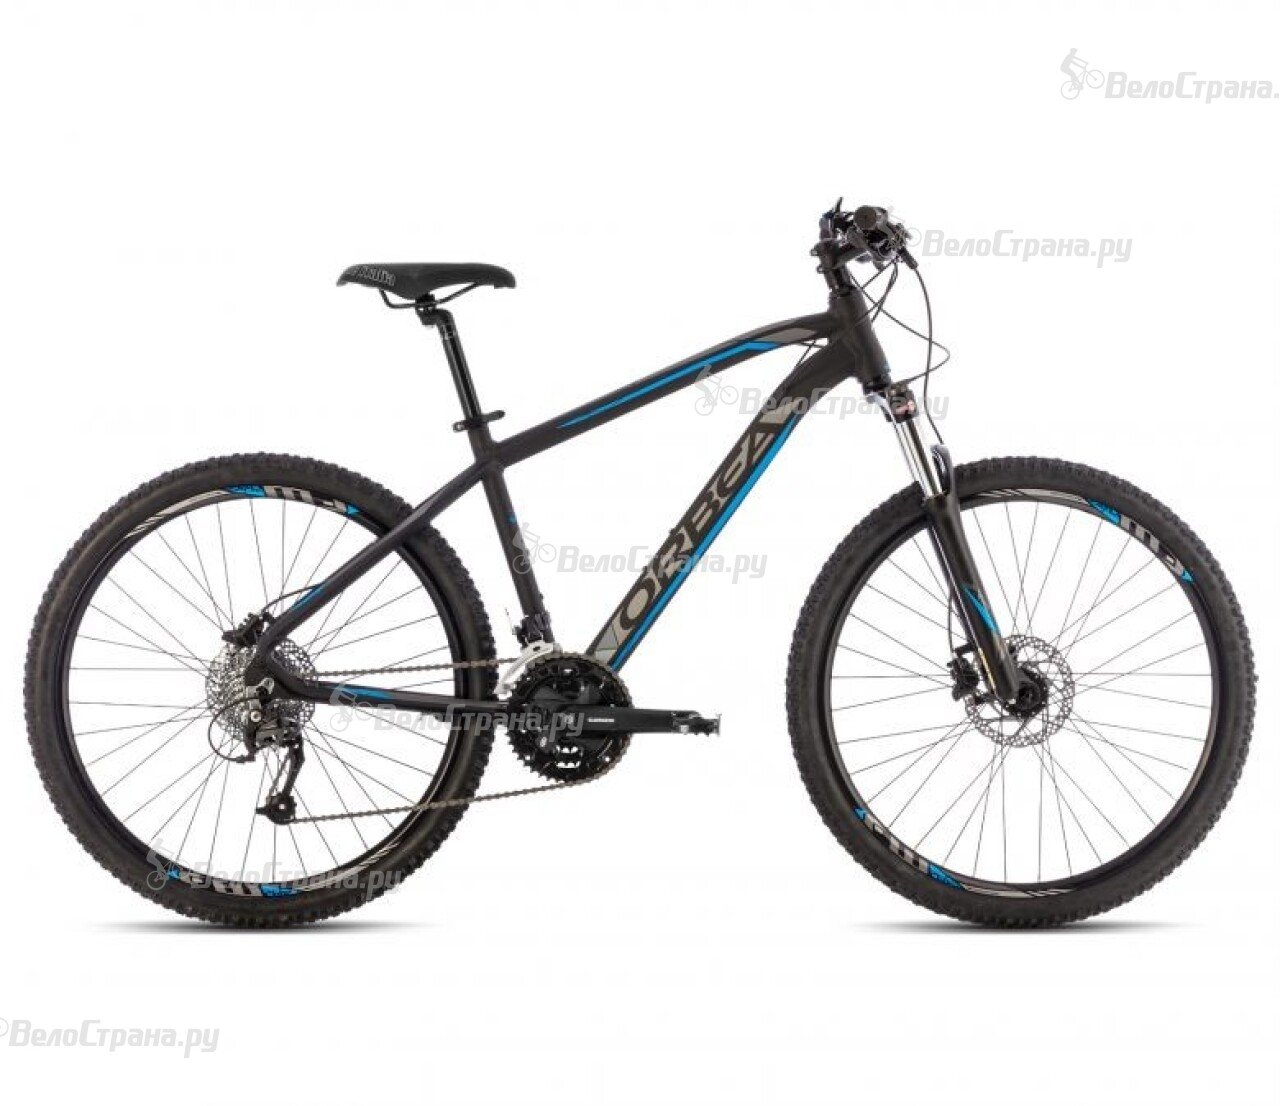 Велосипед Orbea Mx 26 20 Dama (2014) велосипед orbea mx 24 xc 2014